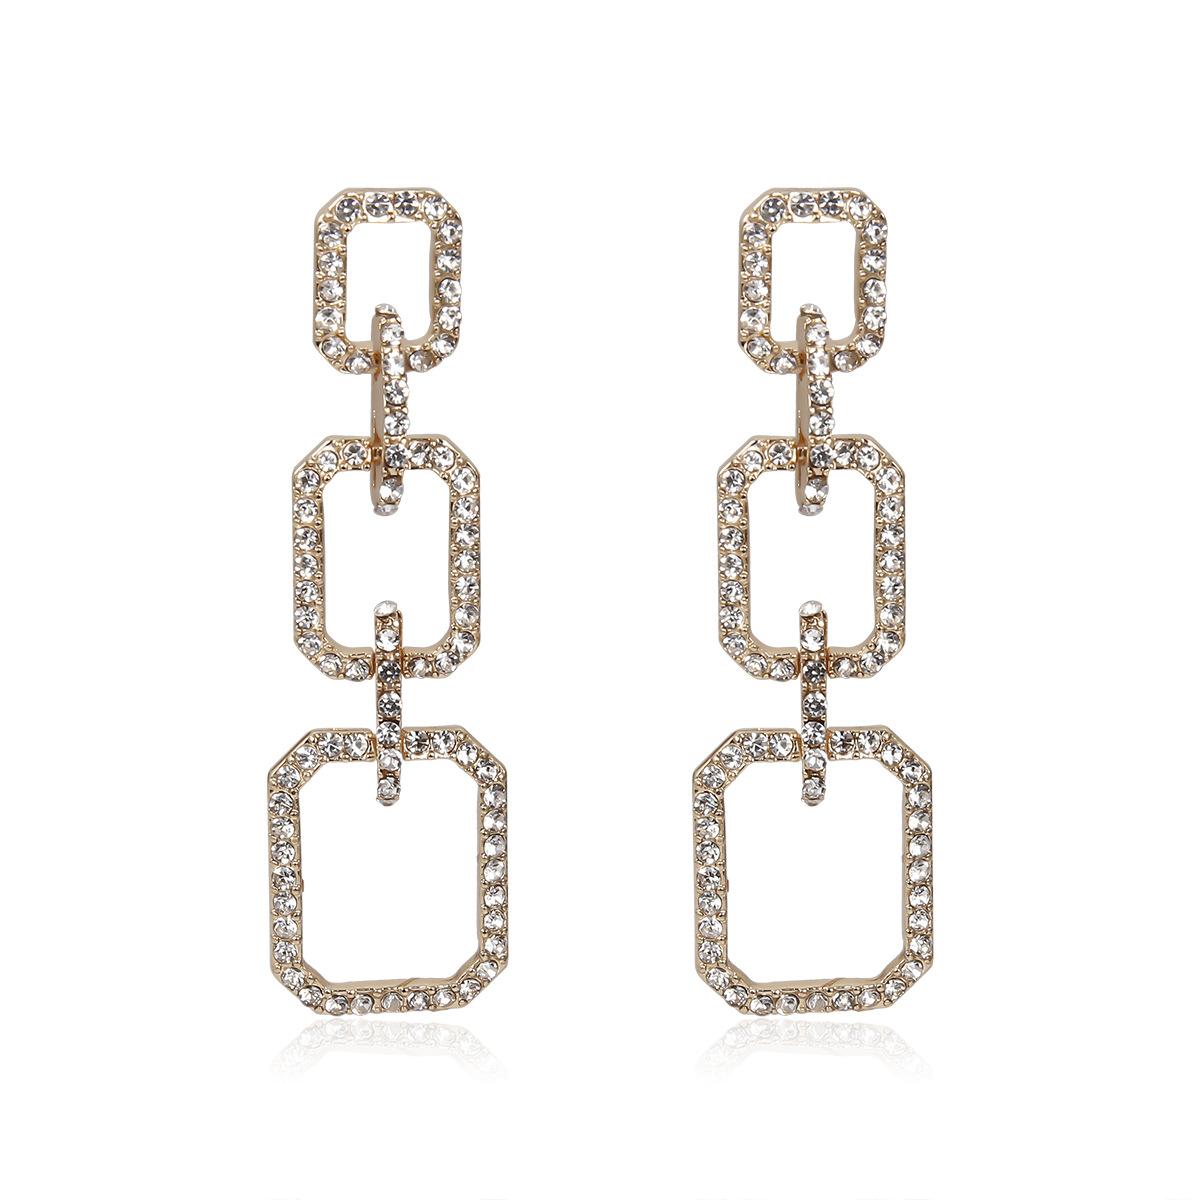 Jewelry diamond geometric earrings female creative alloy plating earrings NHXR190916